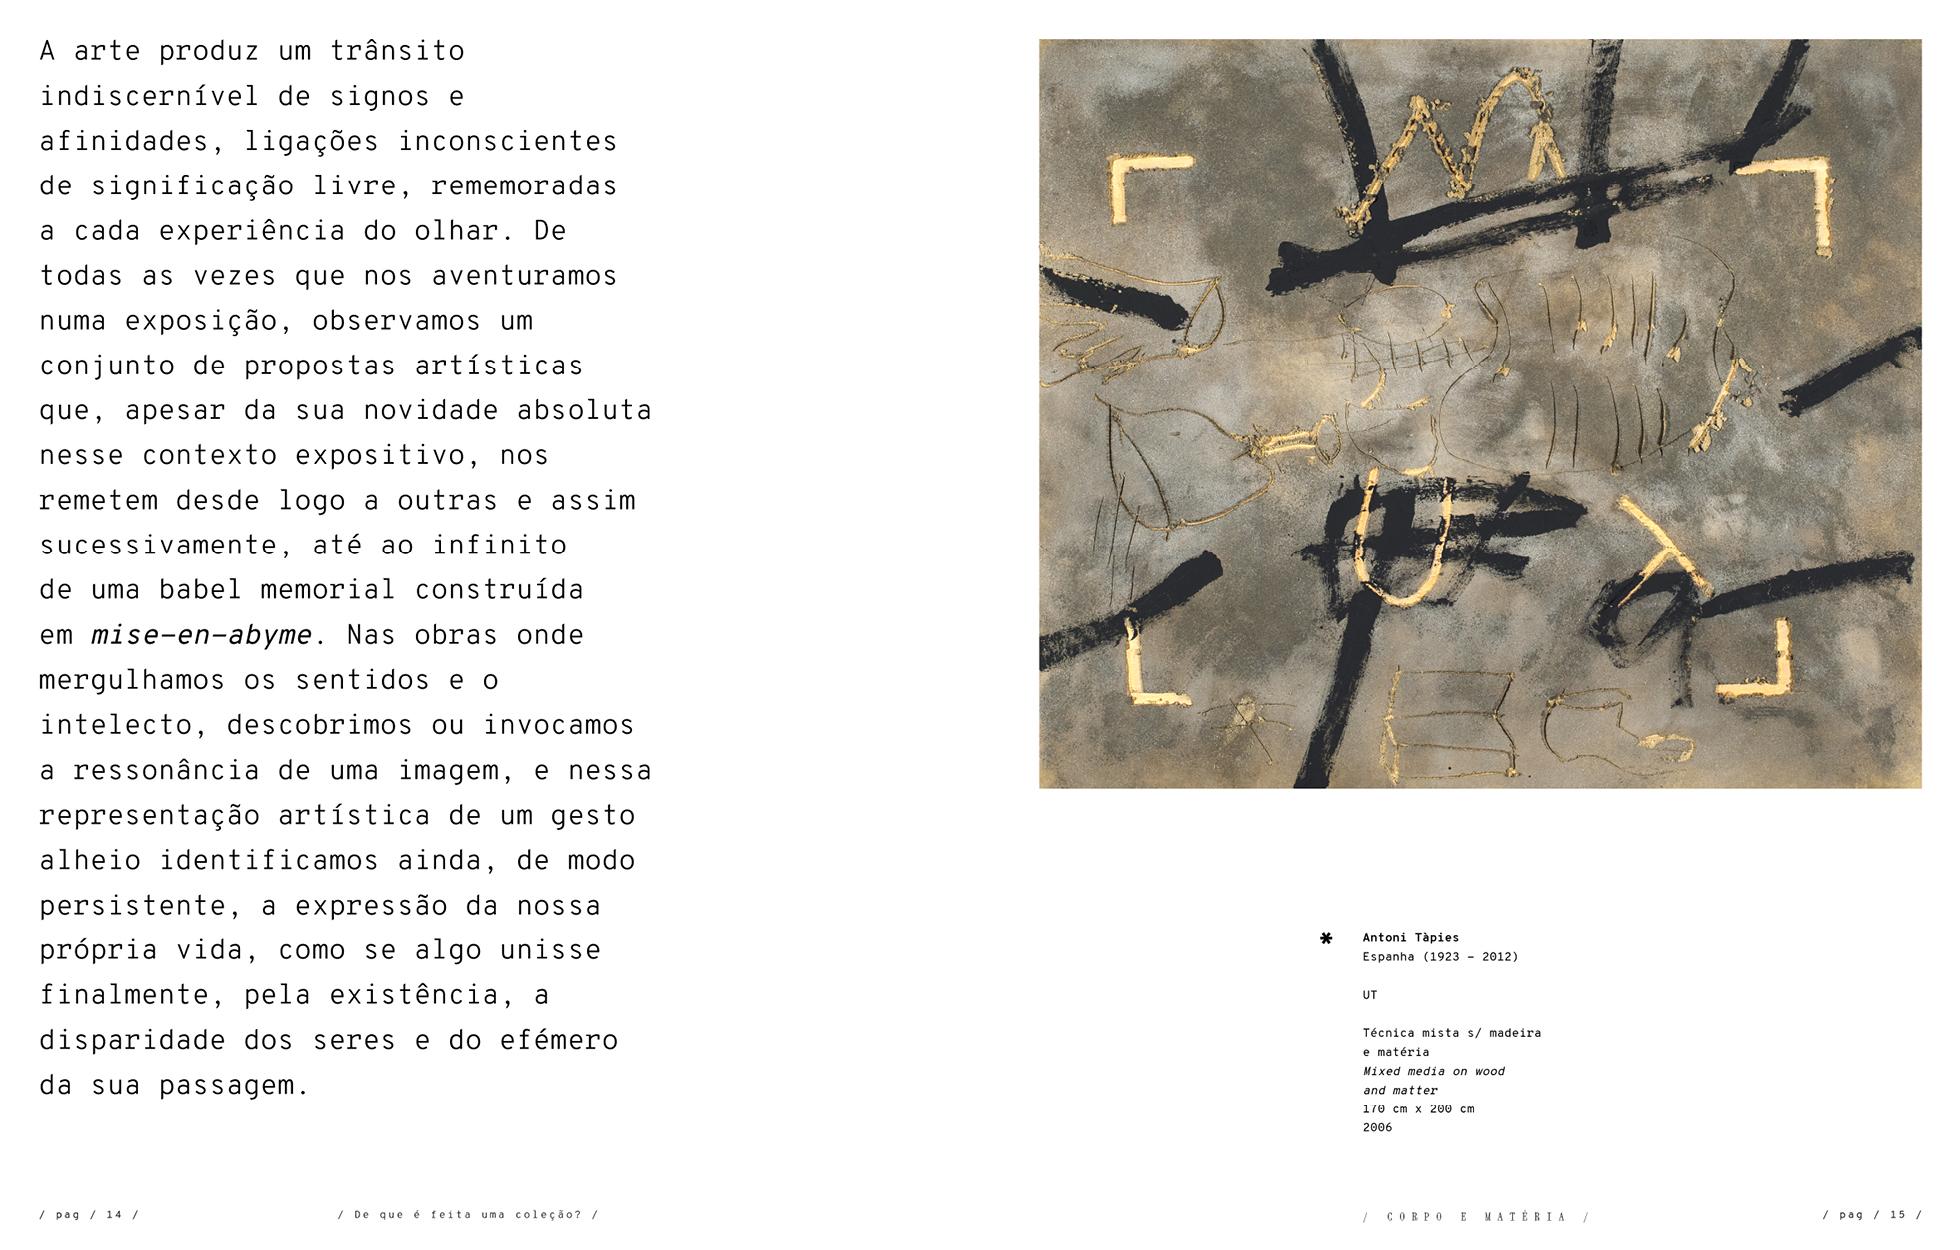 Outland Creative Studio Centro de Arte Contempênea de Coimbra40